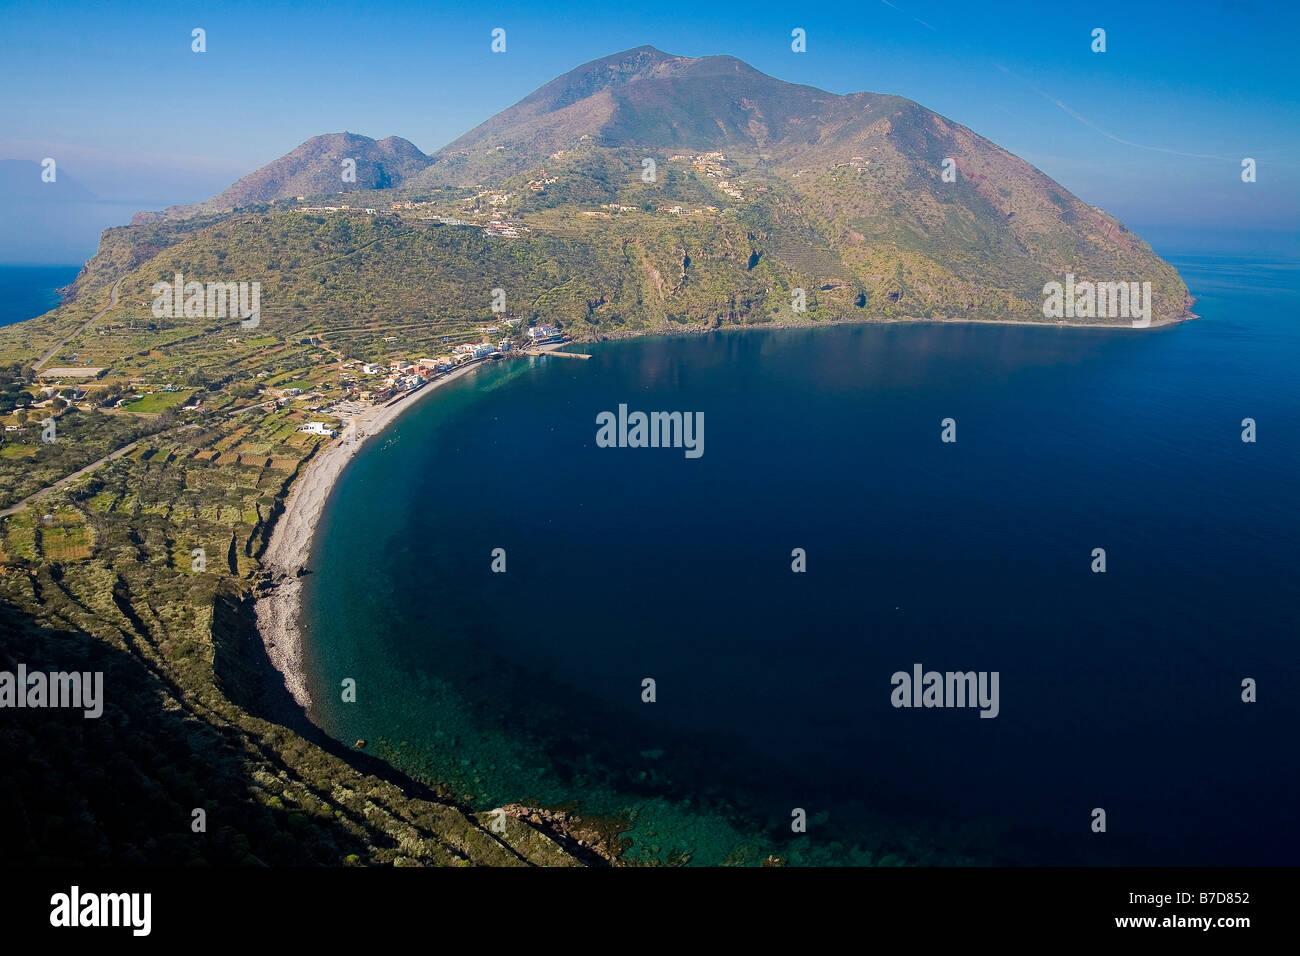 Aerial view, Filicudi island, Aeolian Islands, Sicily, Italy Stock Photo